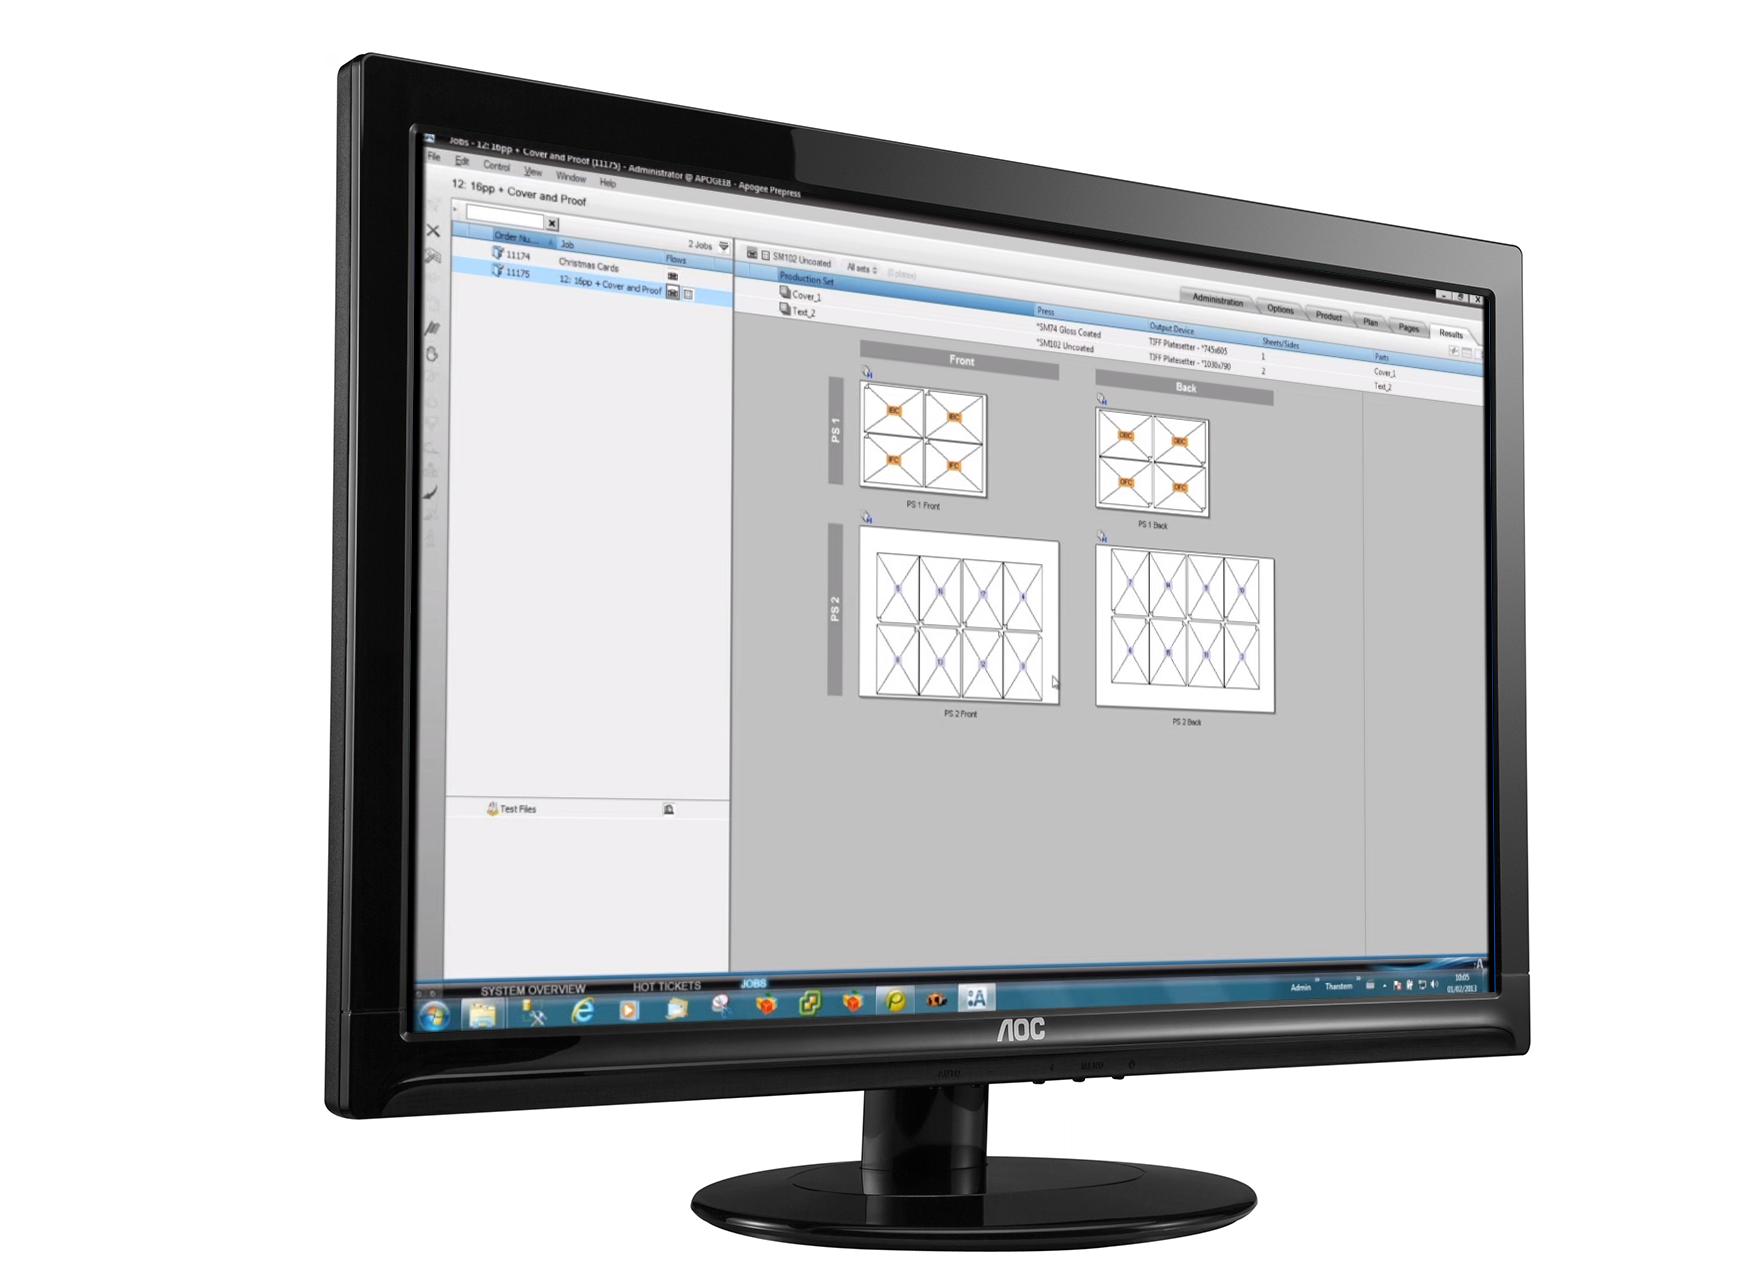 MIS integration with Agfa Apogee screenshot on computer screen